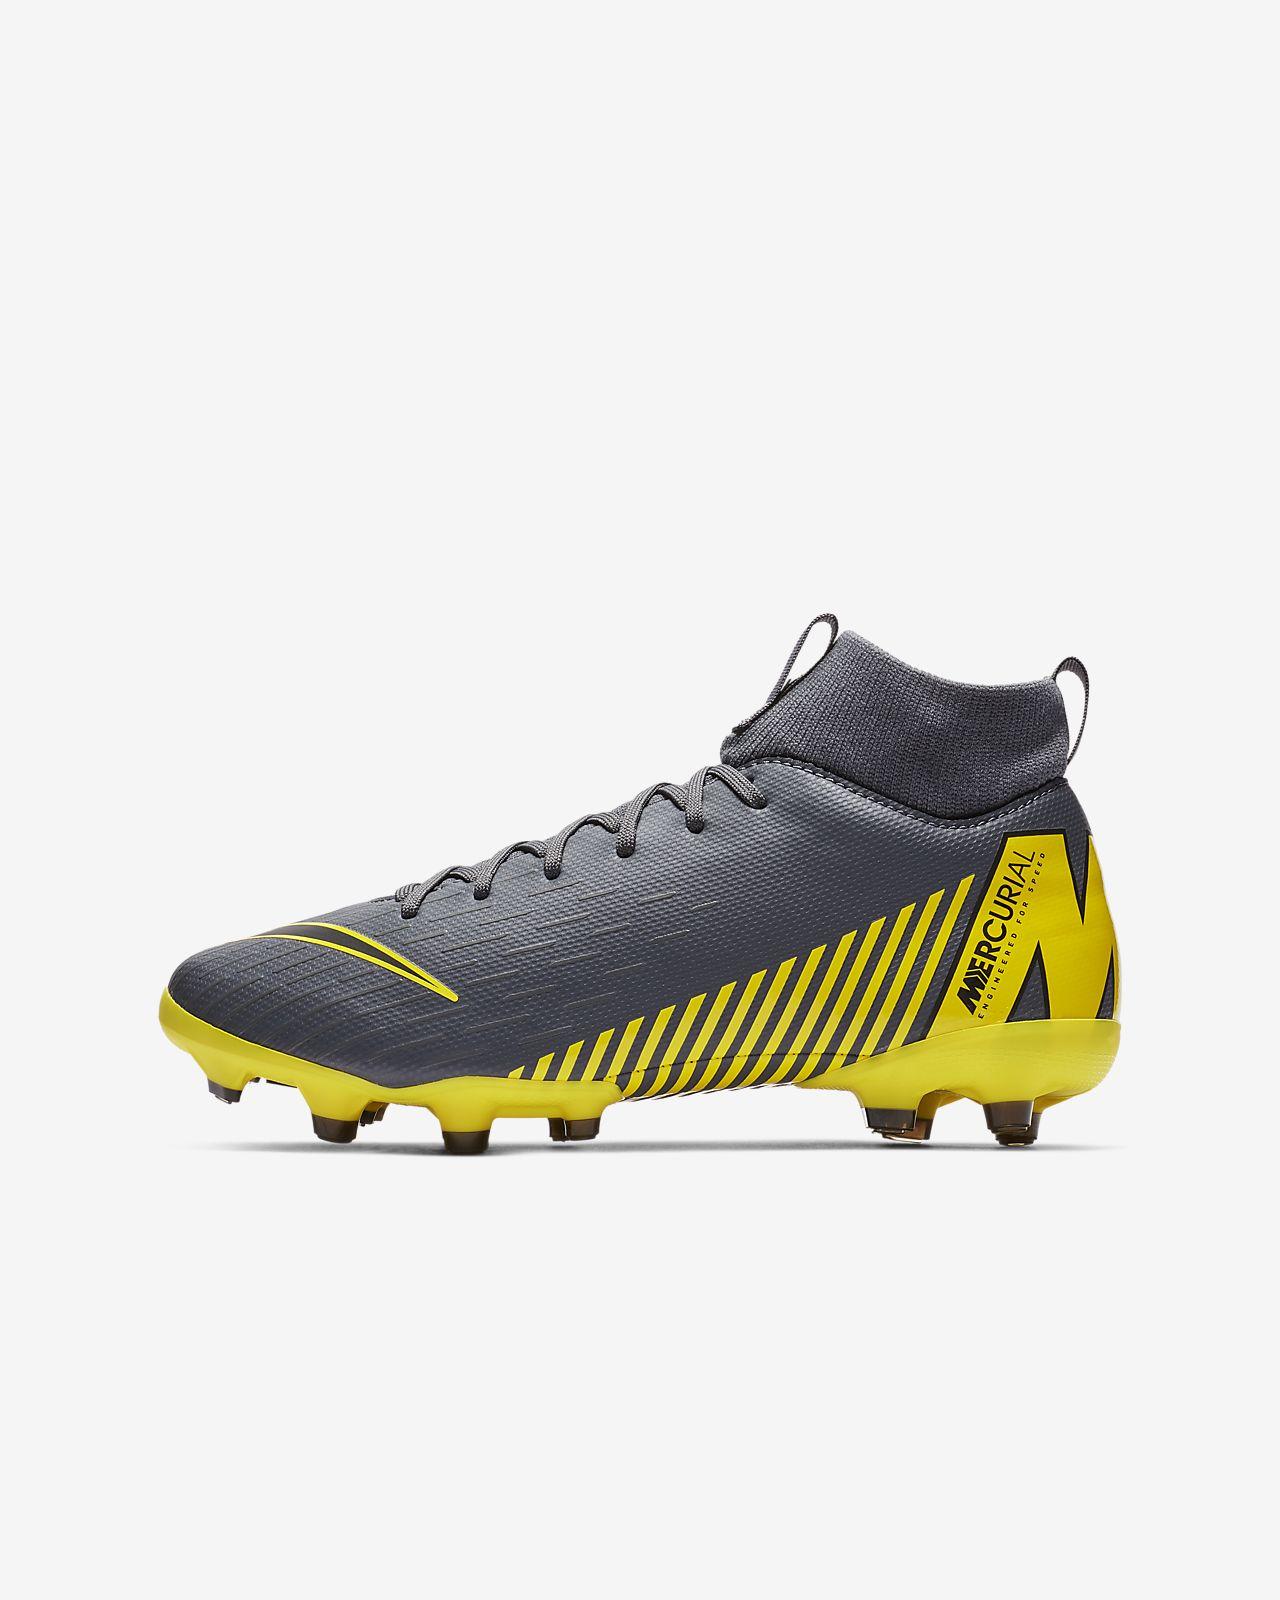 pretty nice 2f179 fea16 ... Chaussure de football multi-terrains à crampons Nike Jr. Superfly 6  Academy MG Game